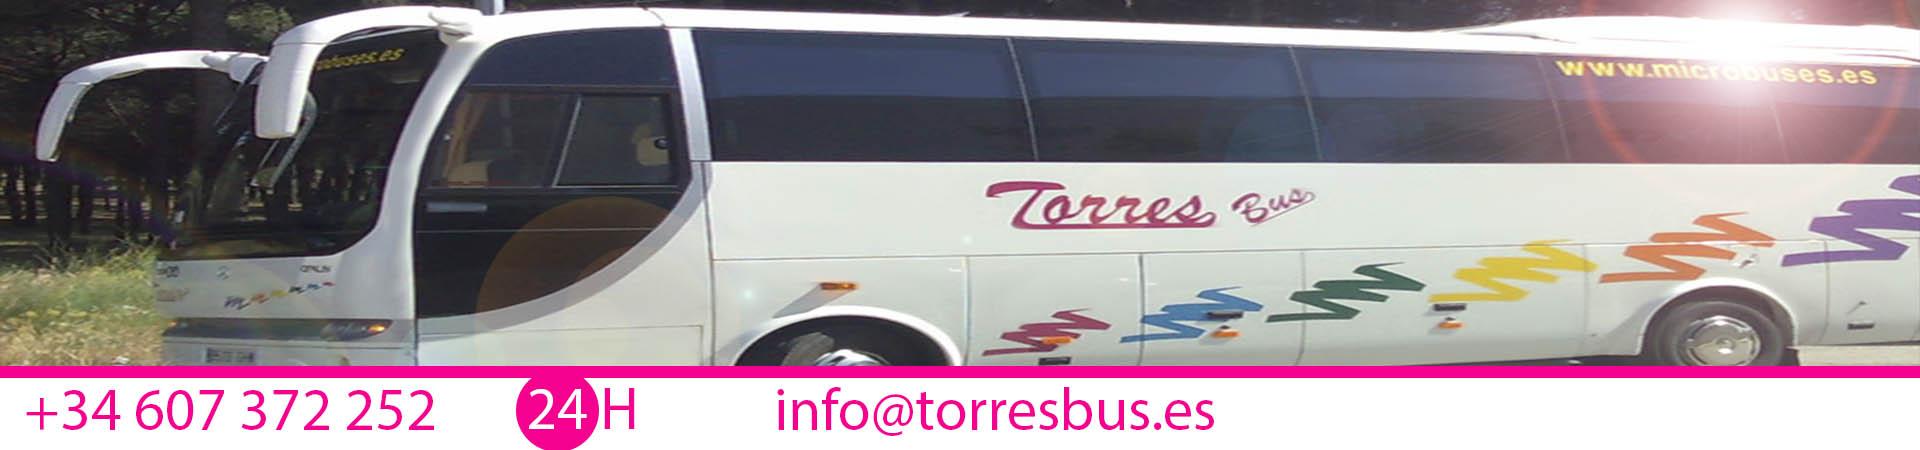 Alquiler De Microbus En Madrid Para Transporte Escolar